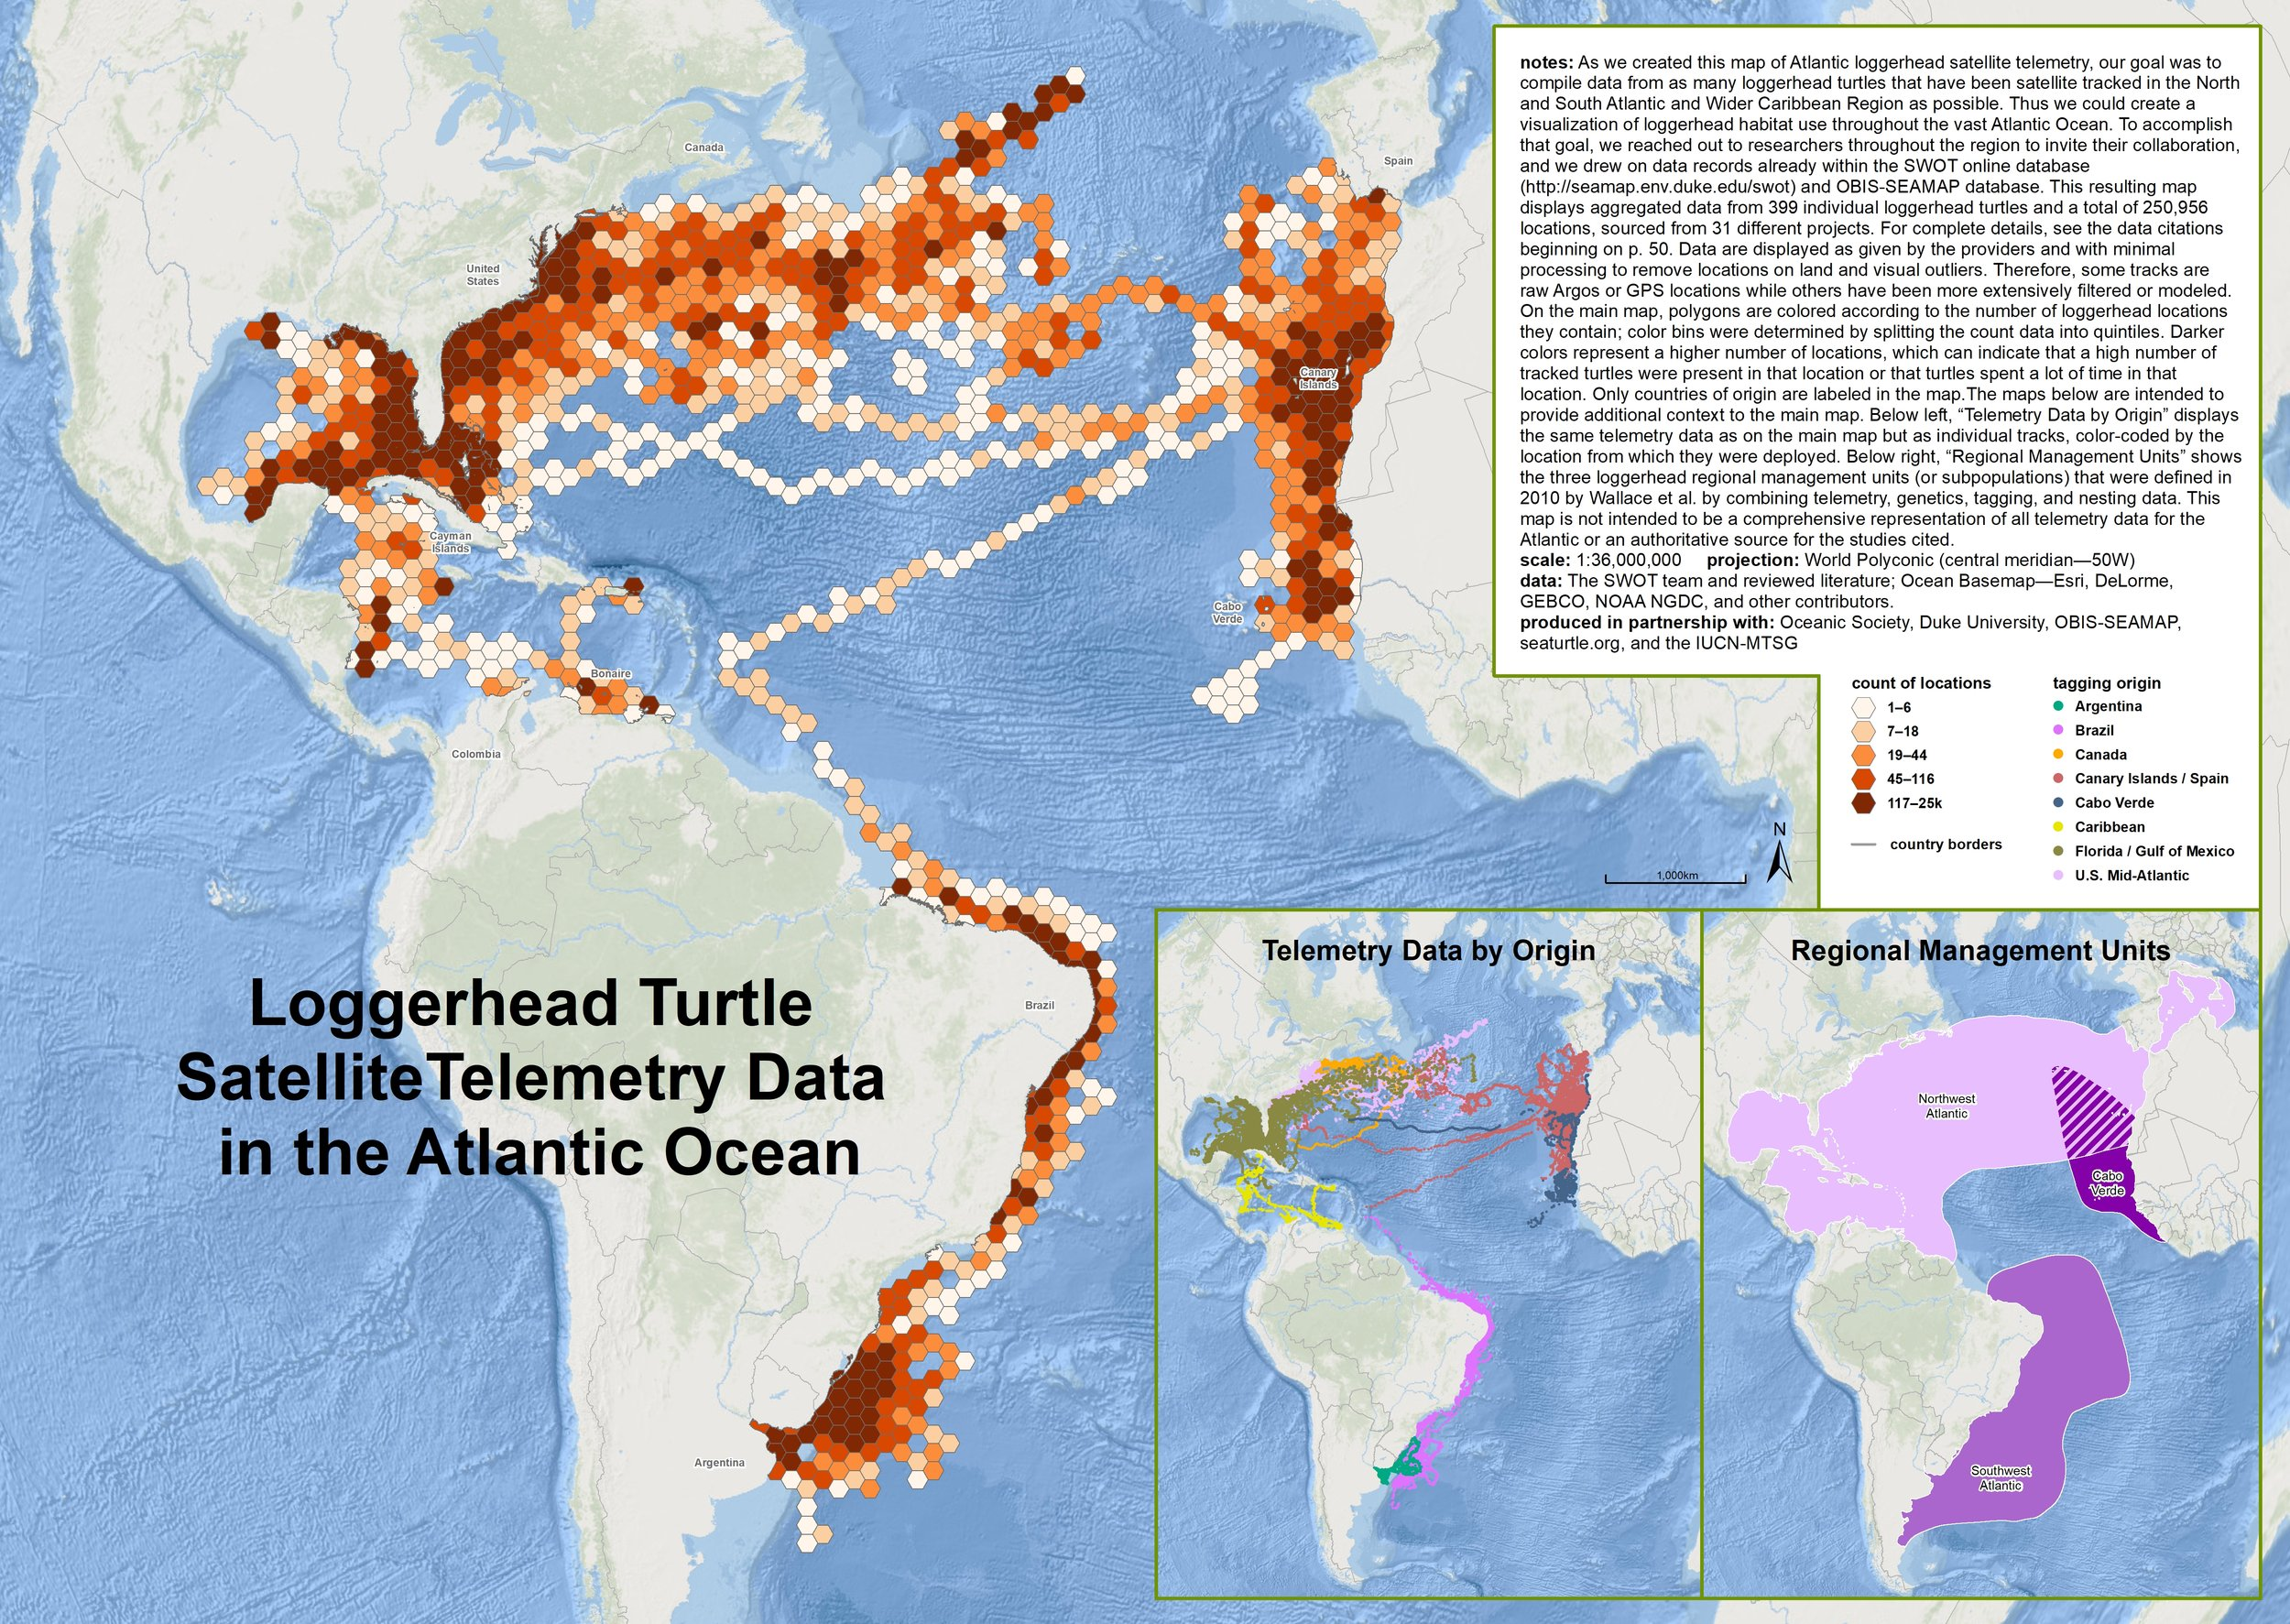 Loggerhead Turtle Satellite Telemetry Data in the Atlantic Ocean ( data citations ) |   SWOT Report   , vol. XIV (2019) .